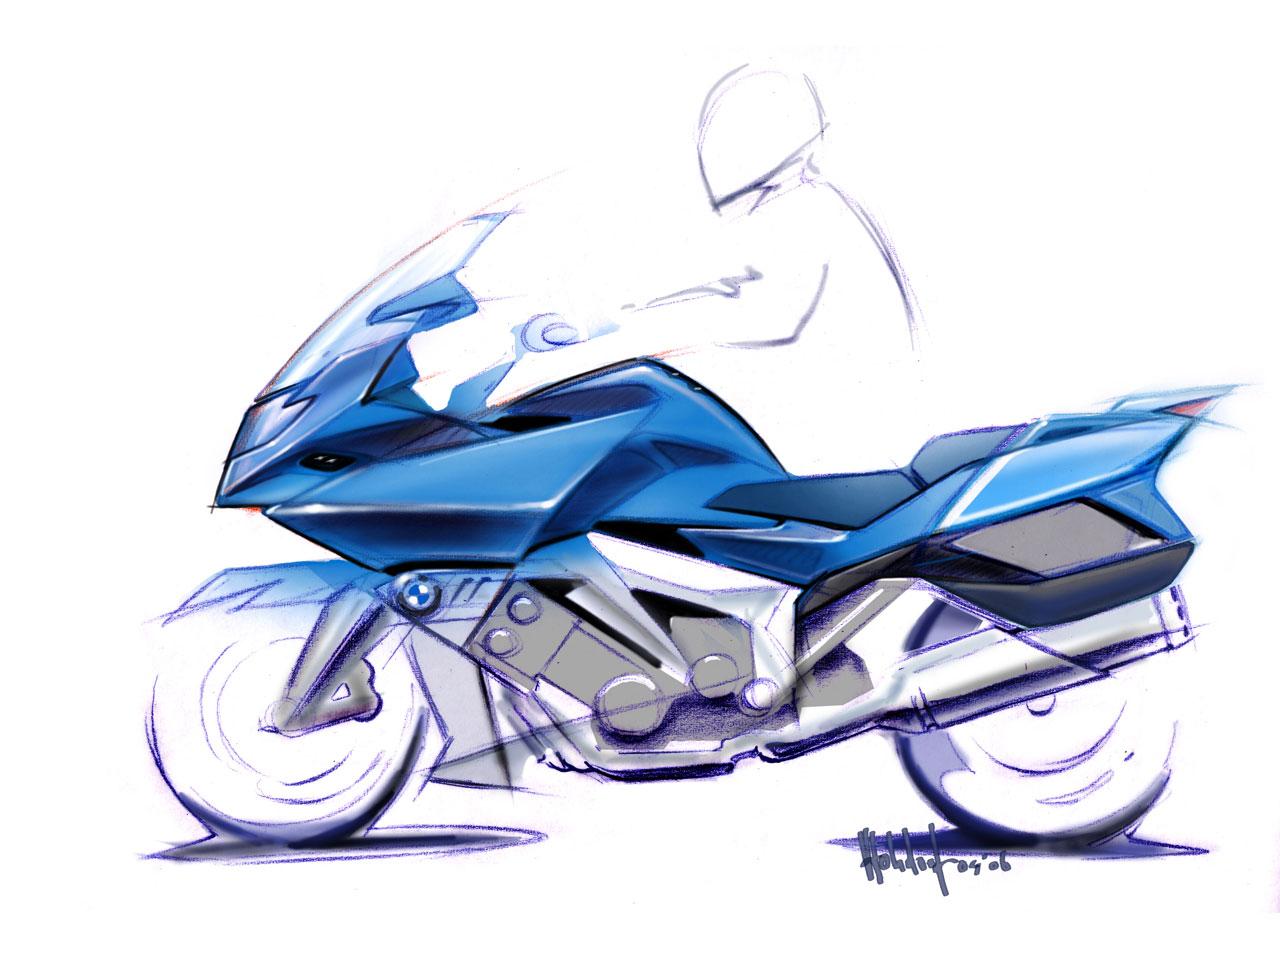 Bmw K 1600 Gt Design Sketch Car Body Design